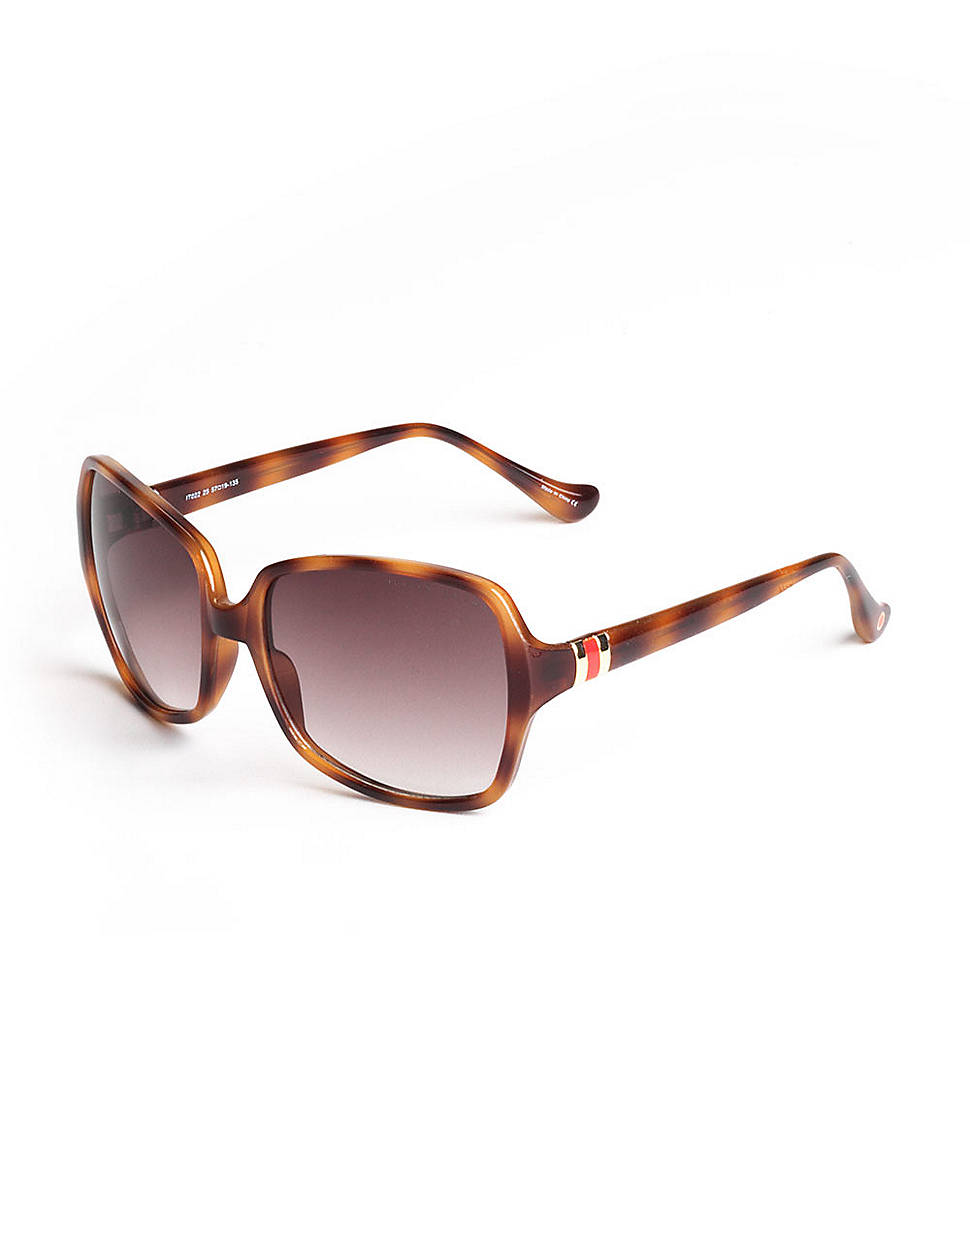 13a87319dbb Ivanka Trump Rectangular Tortoise Shell Sunglasses in Brown for Men ...